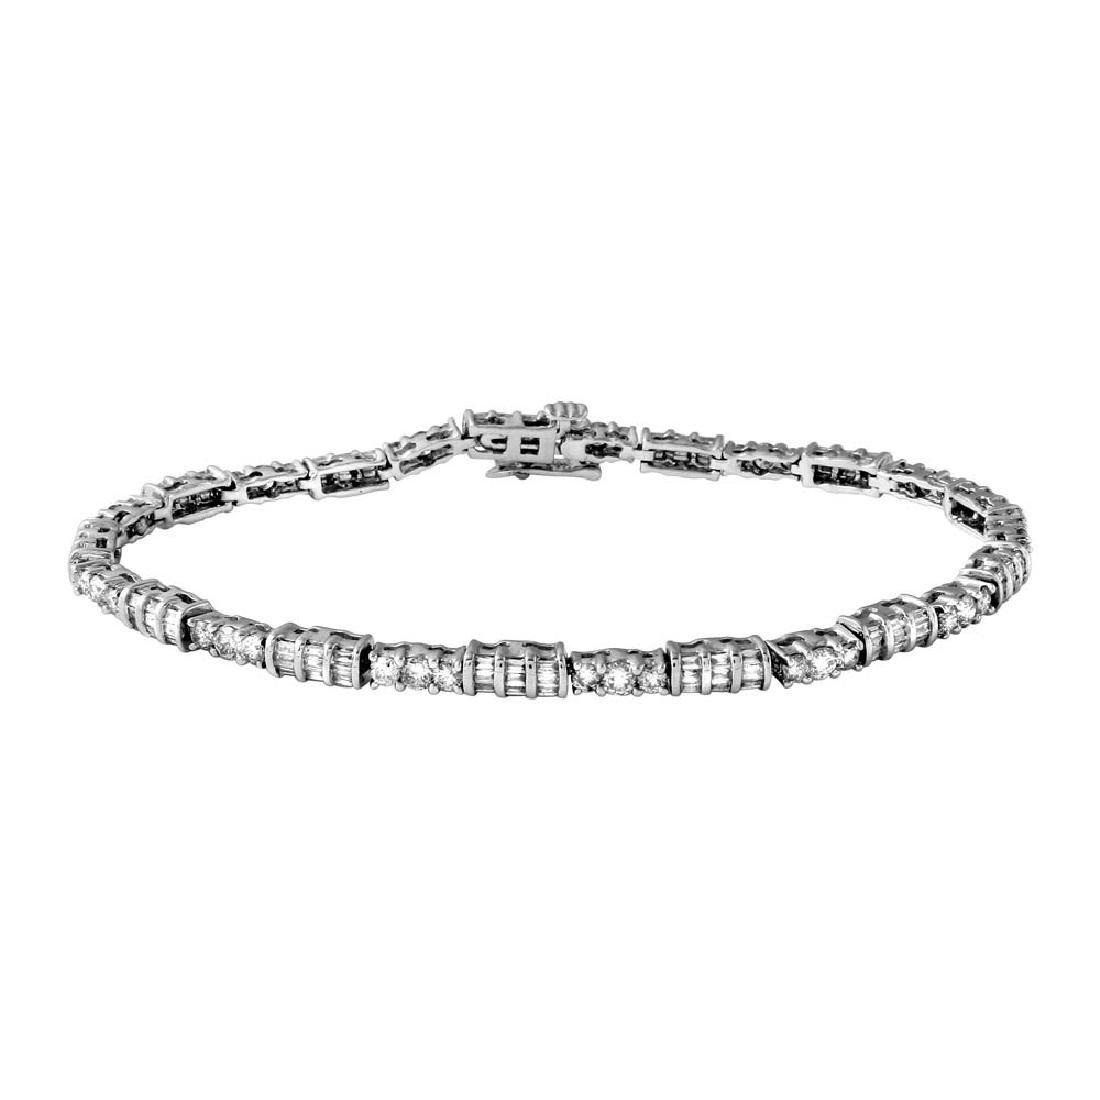 Genuine 3.1 TCW 14K White Gold Ladies Bracelet